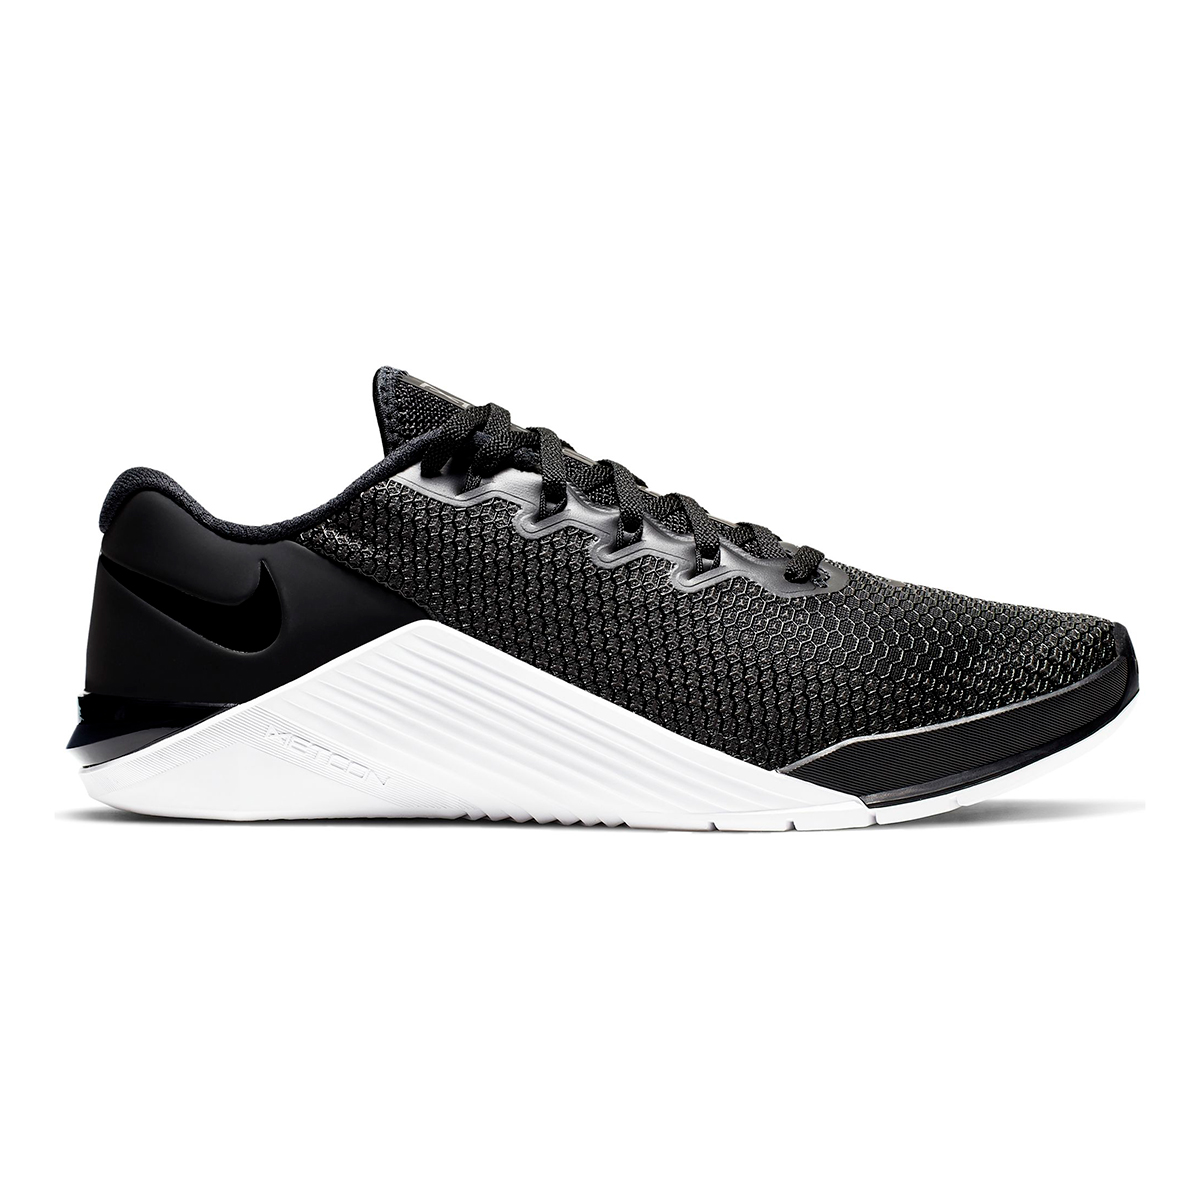 Women's Nike Metcon 5 Training Shoes  - Color: Black/Black White/Wolf Grey - Size: 5 - Width: Regular, Black/Black White/Wolf Grey, large, image 1